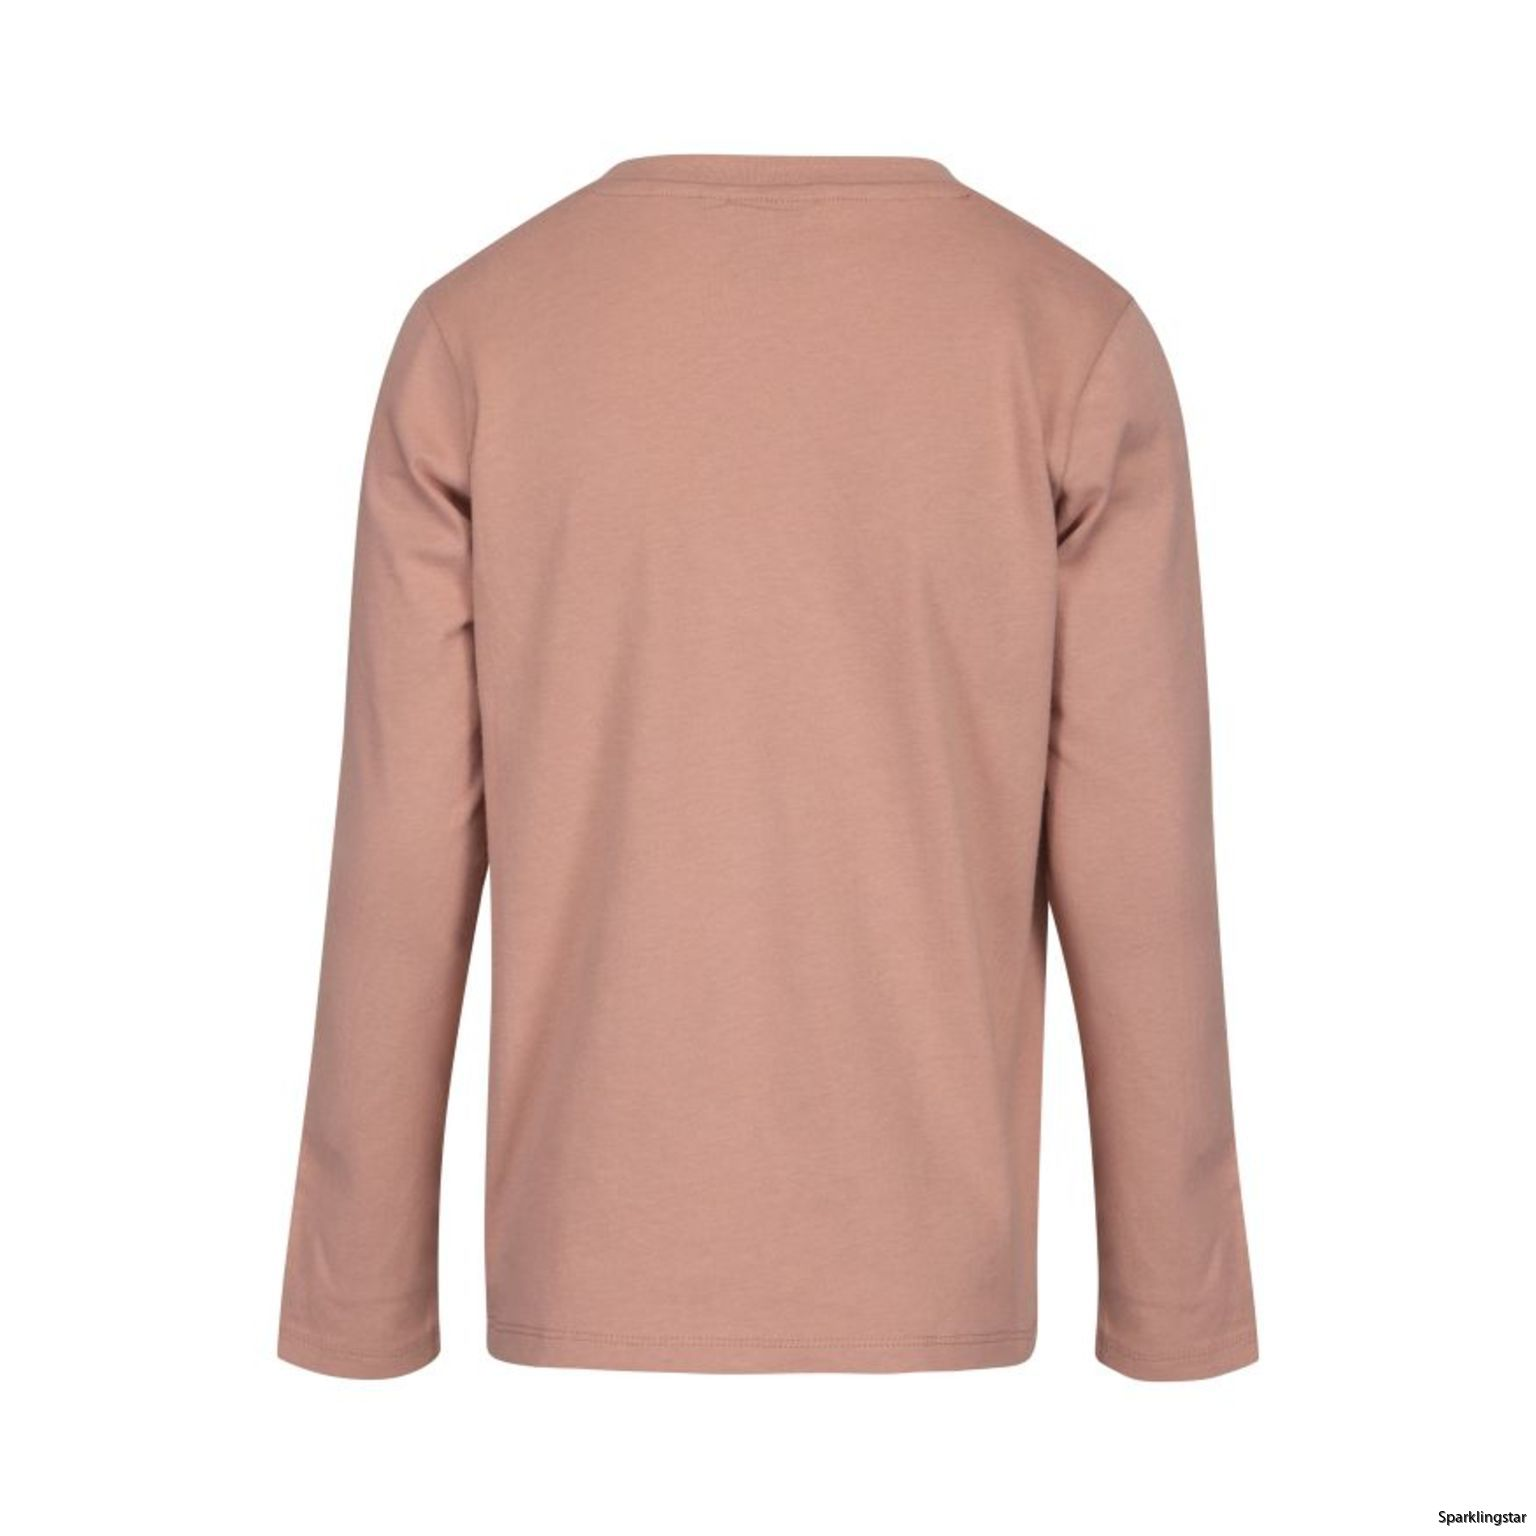 Petit Sofie Schnoor Silvia T-shirt